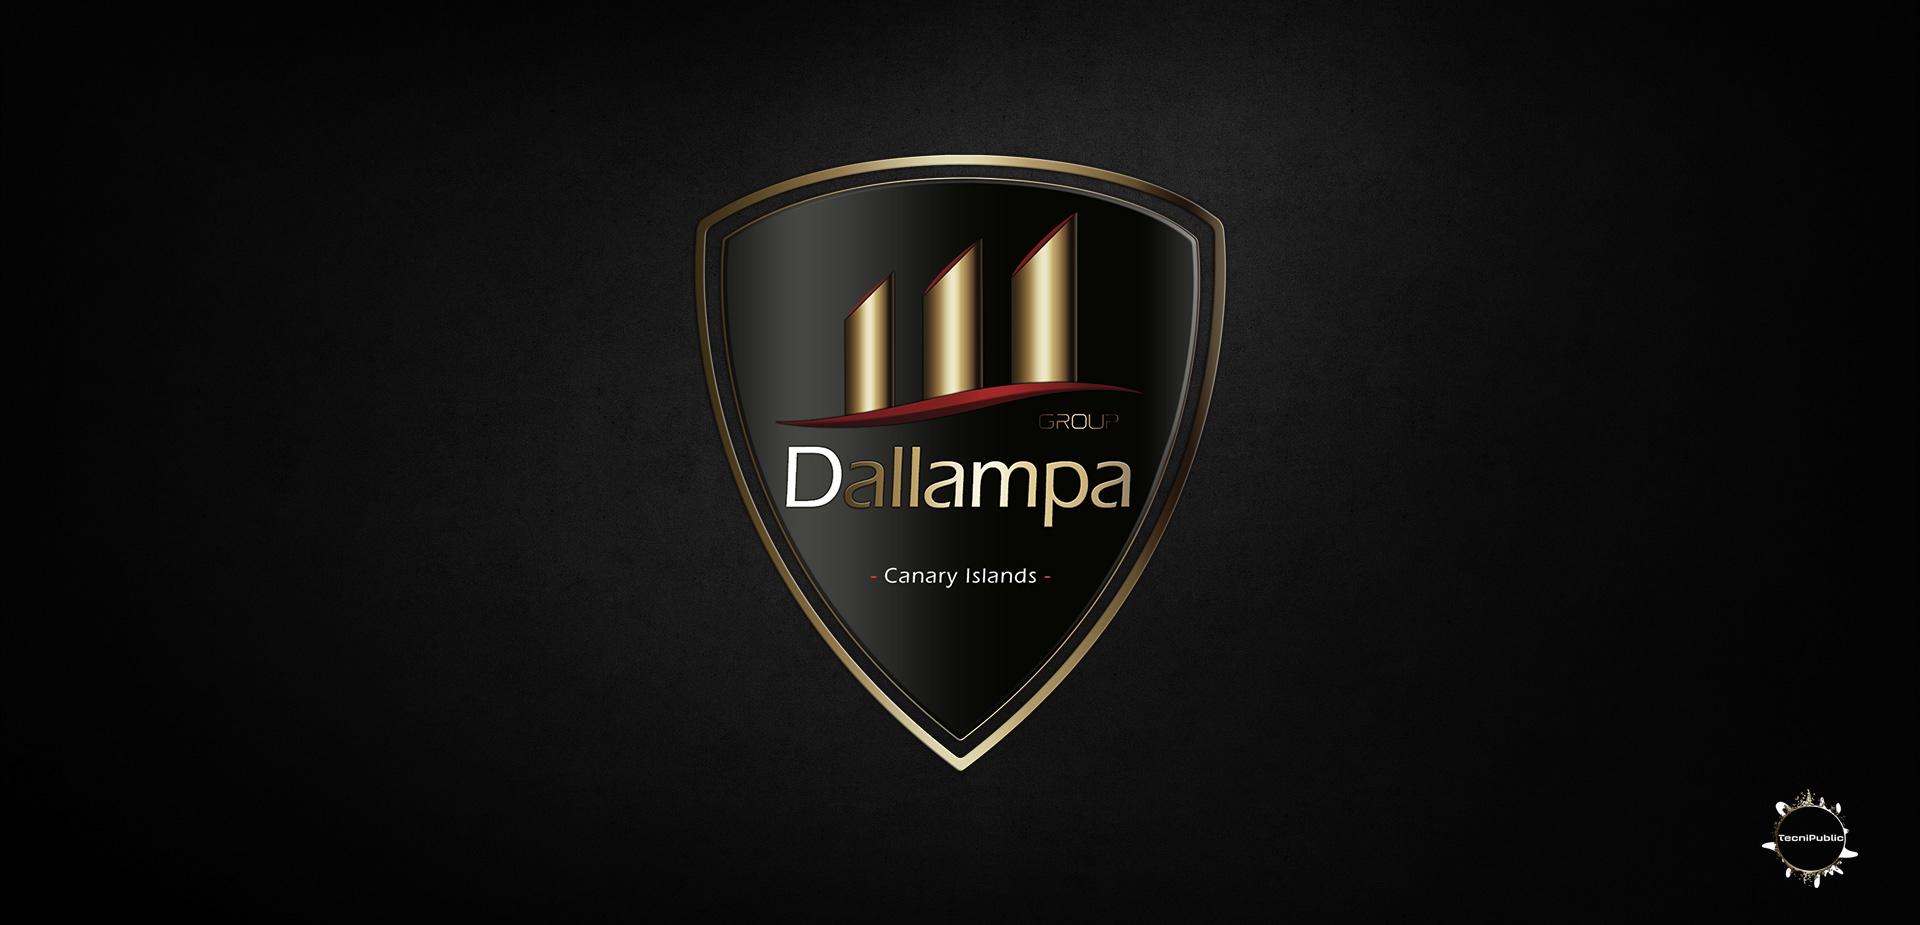 Logotipo secundario del Grupo Dallampa